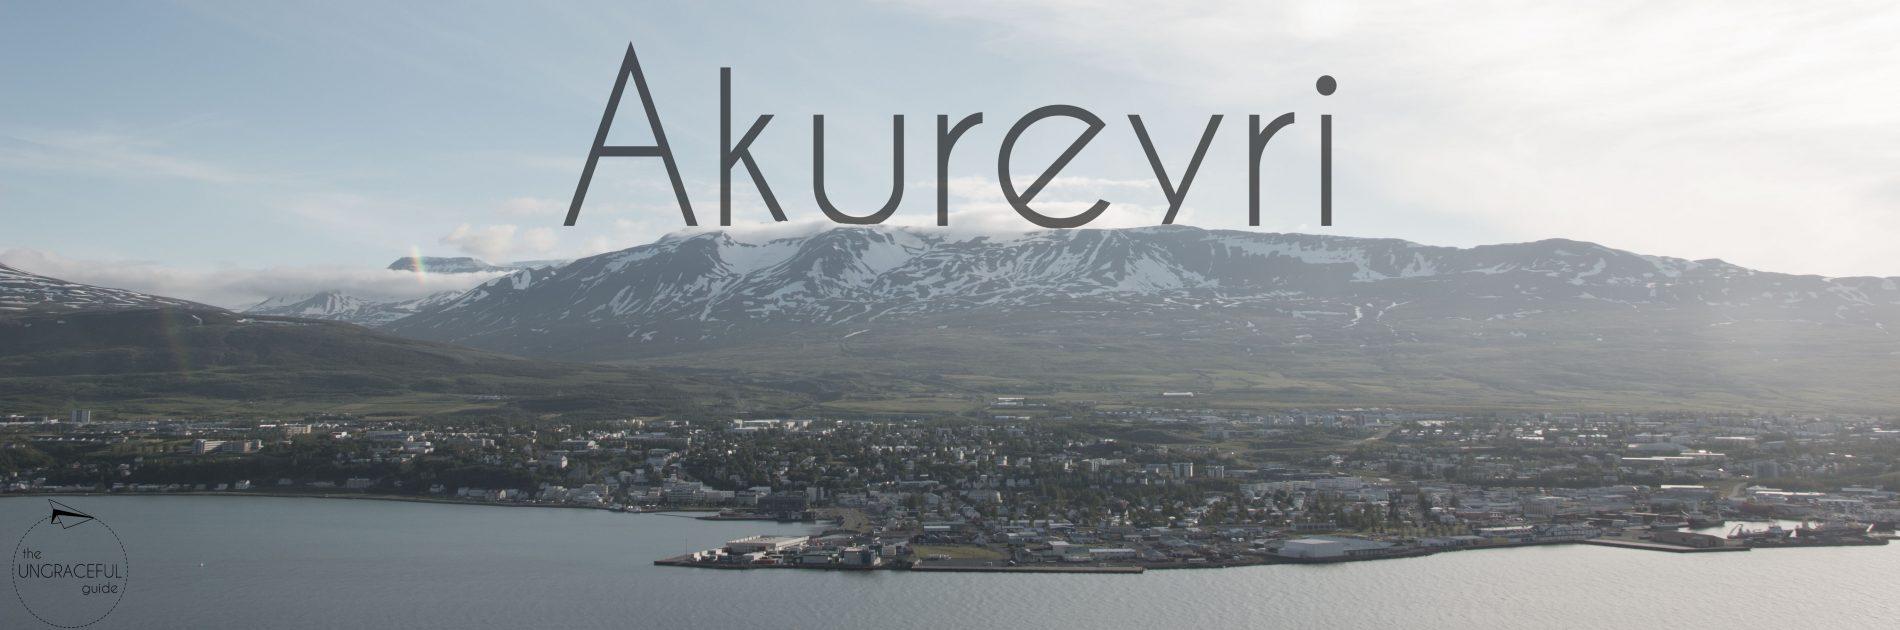 "<img src=""data:image/gif;base64,R0lGODdhAQABAPAAAP///wAAACwAAAAAAQABAEACAkQBADs="" data-lazy-src=""images/"" width=""800"" height=""600"" alt=""iceland - ak - Iceland: How to get the most on a budget"">"